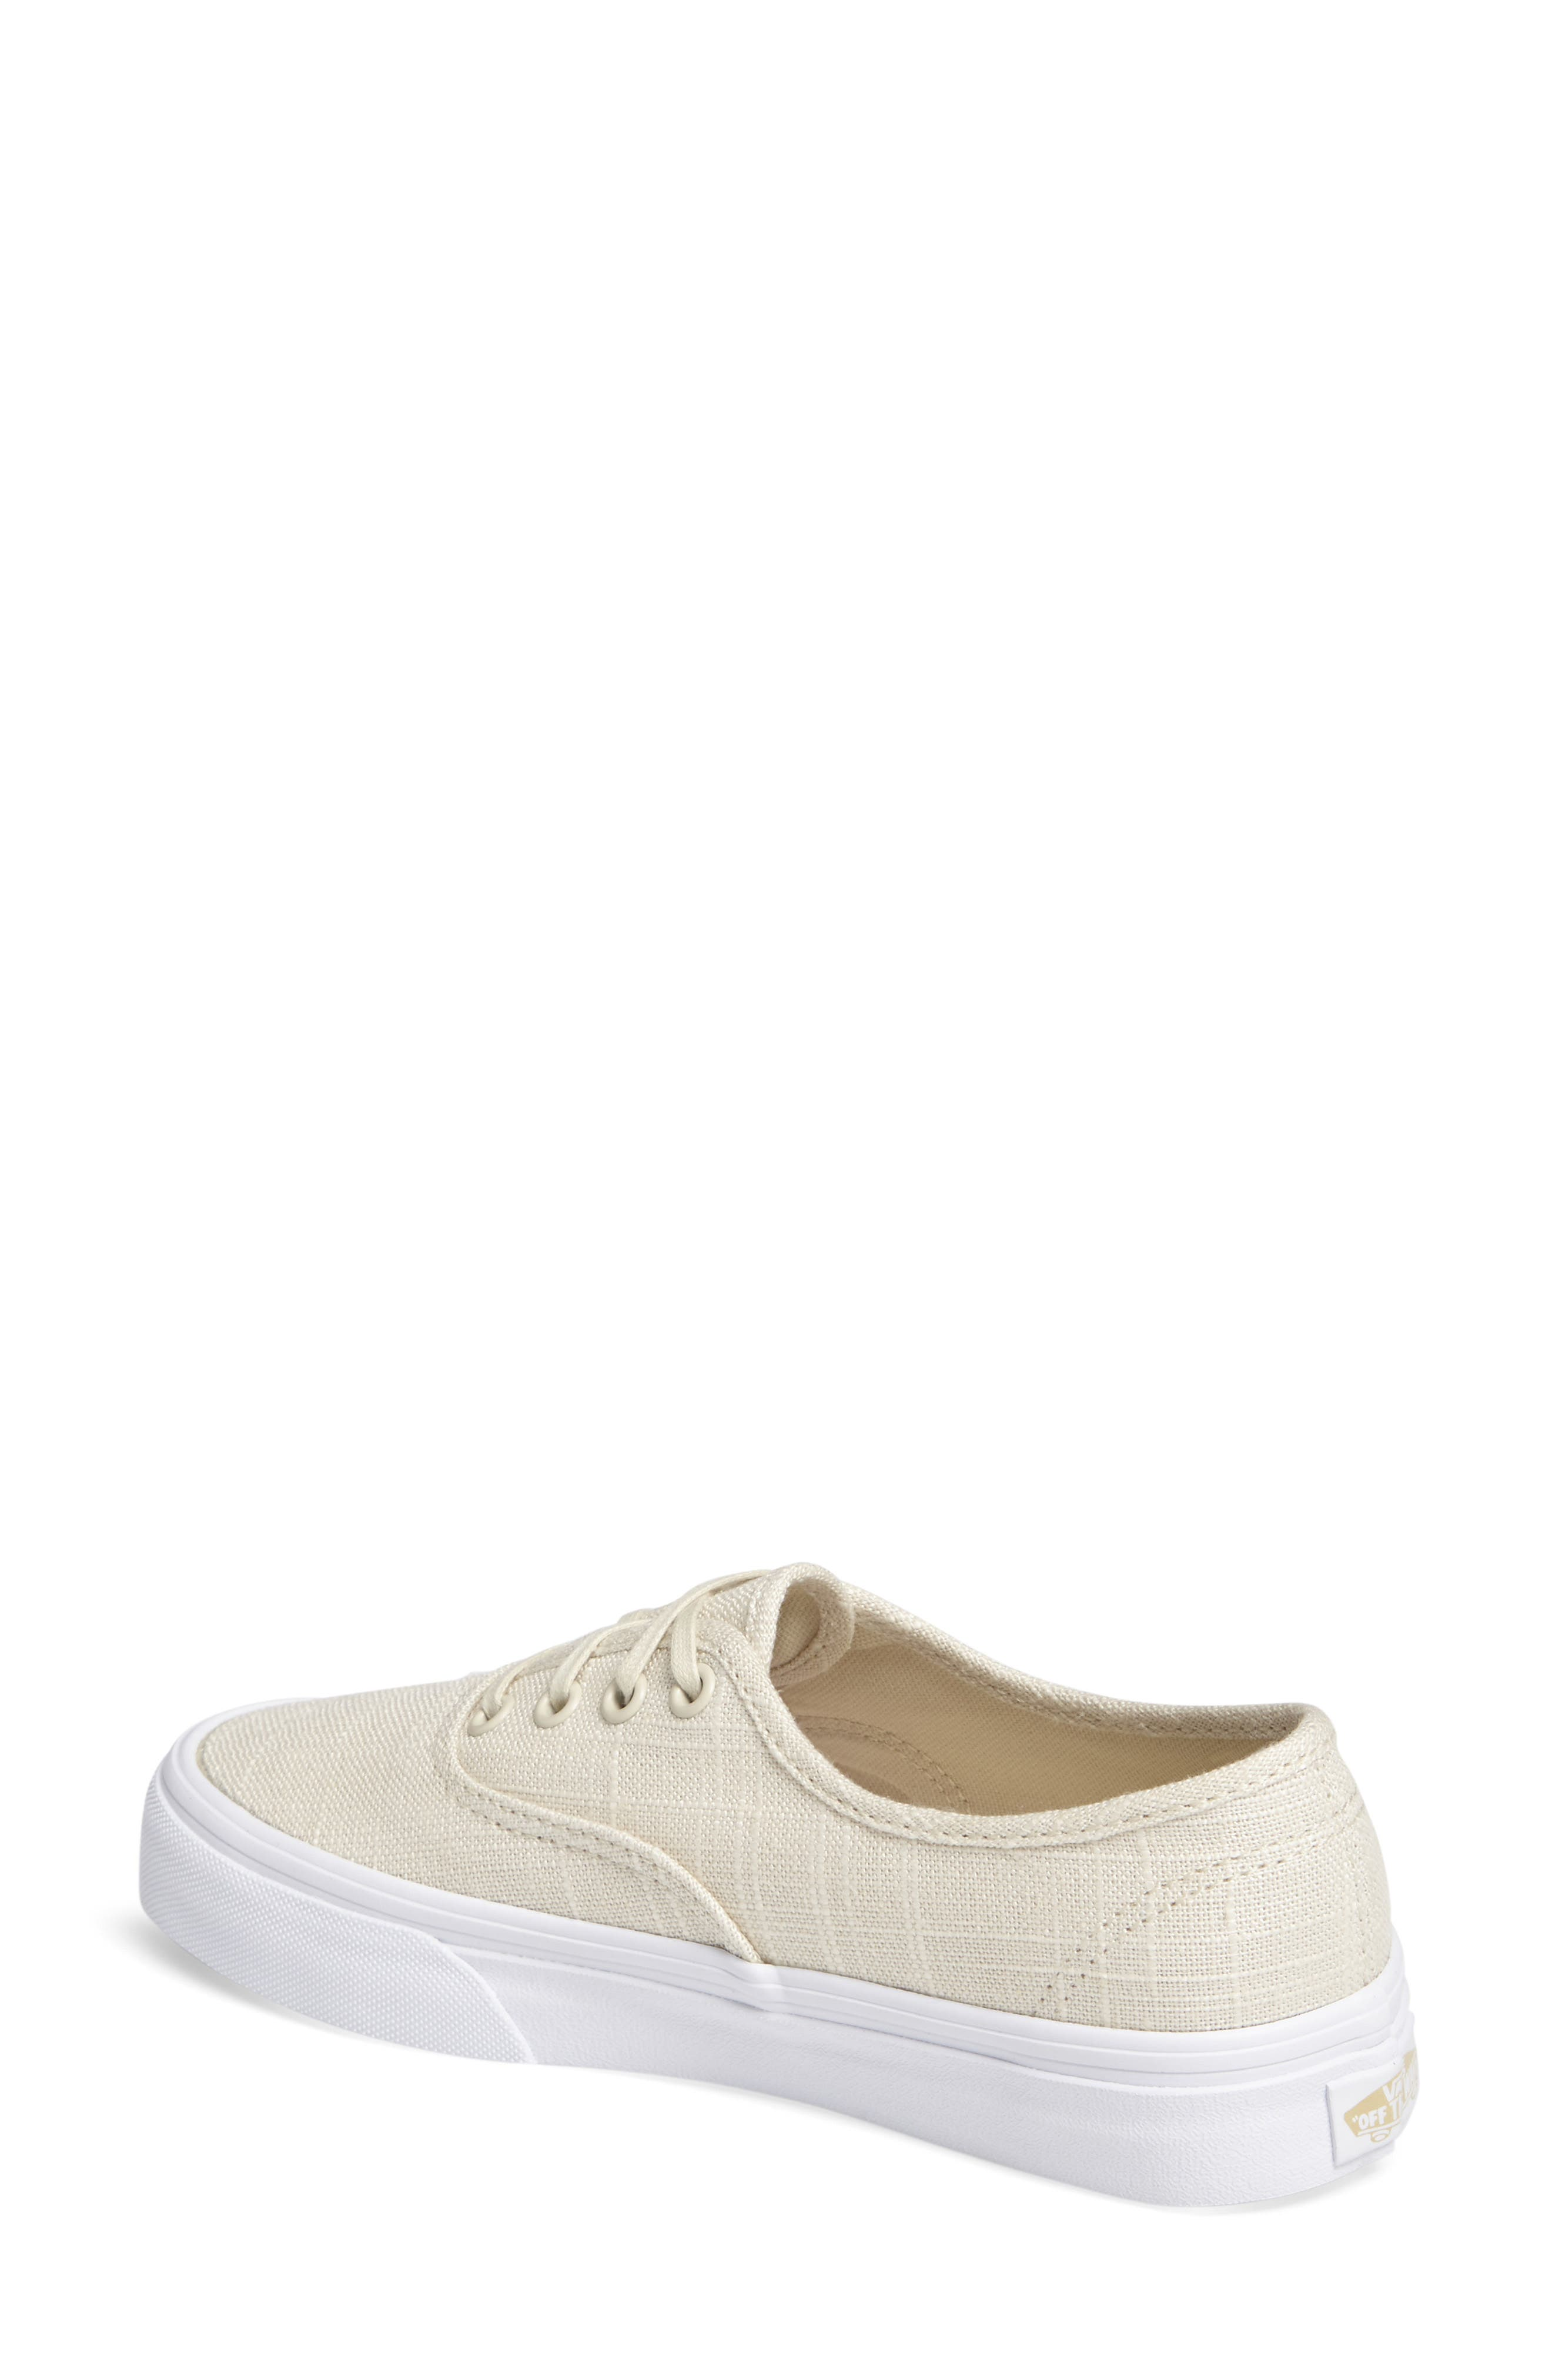 ,                             'Authentic' Sneaker,                             Alternate thumbnail 581, color,                             271